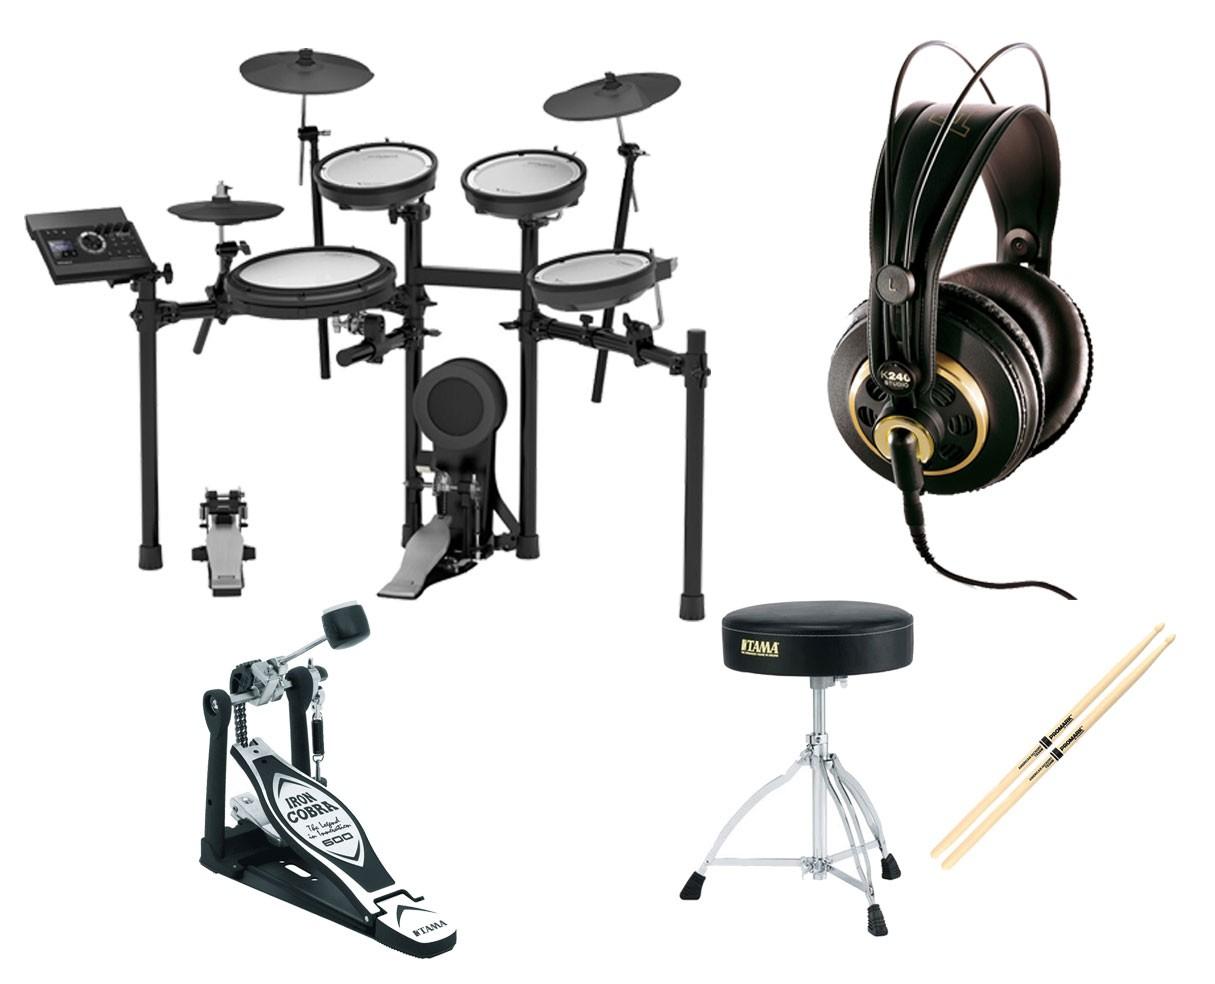 Roland TD-17KVS Electronic Drum Set + Kick Pedal + Throne + Headphones + Sticks